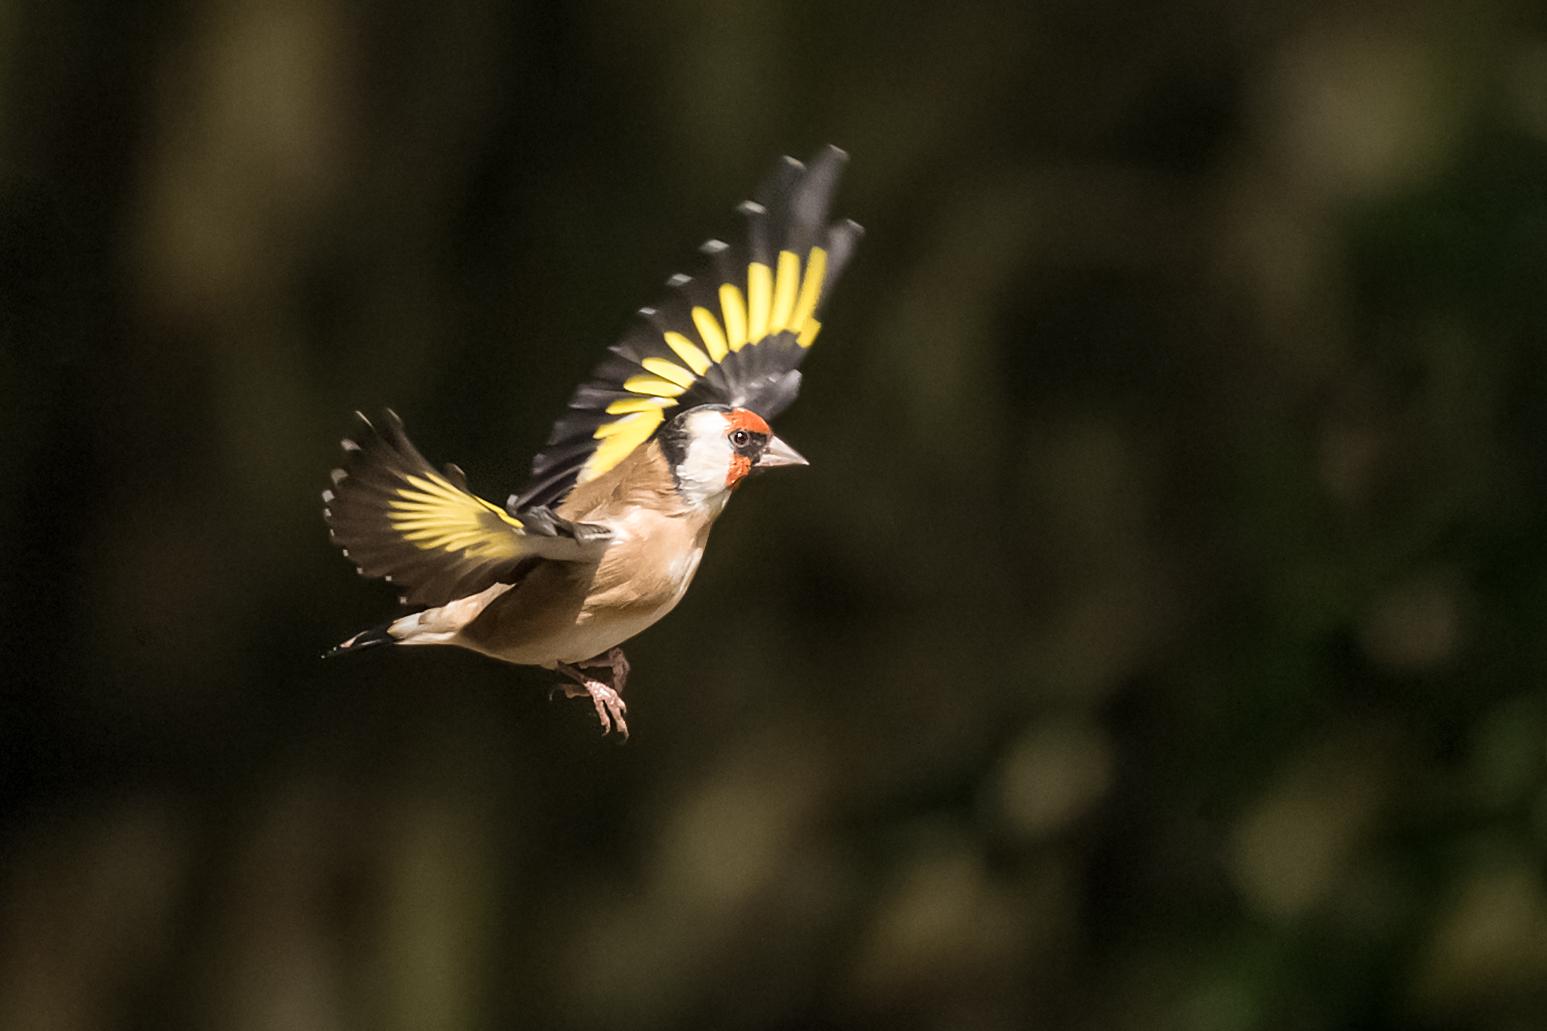 Goldfinch flight #3